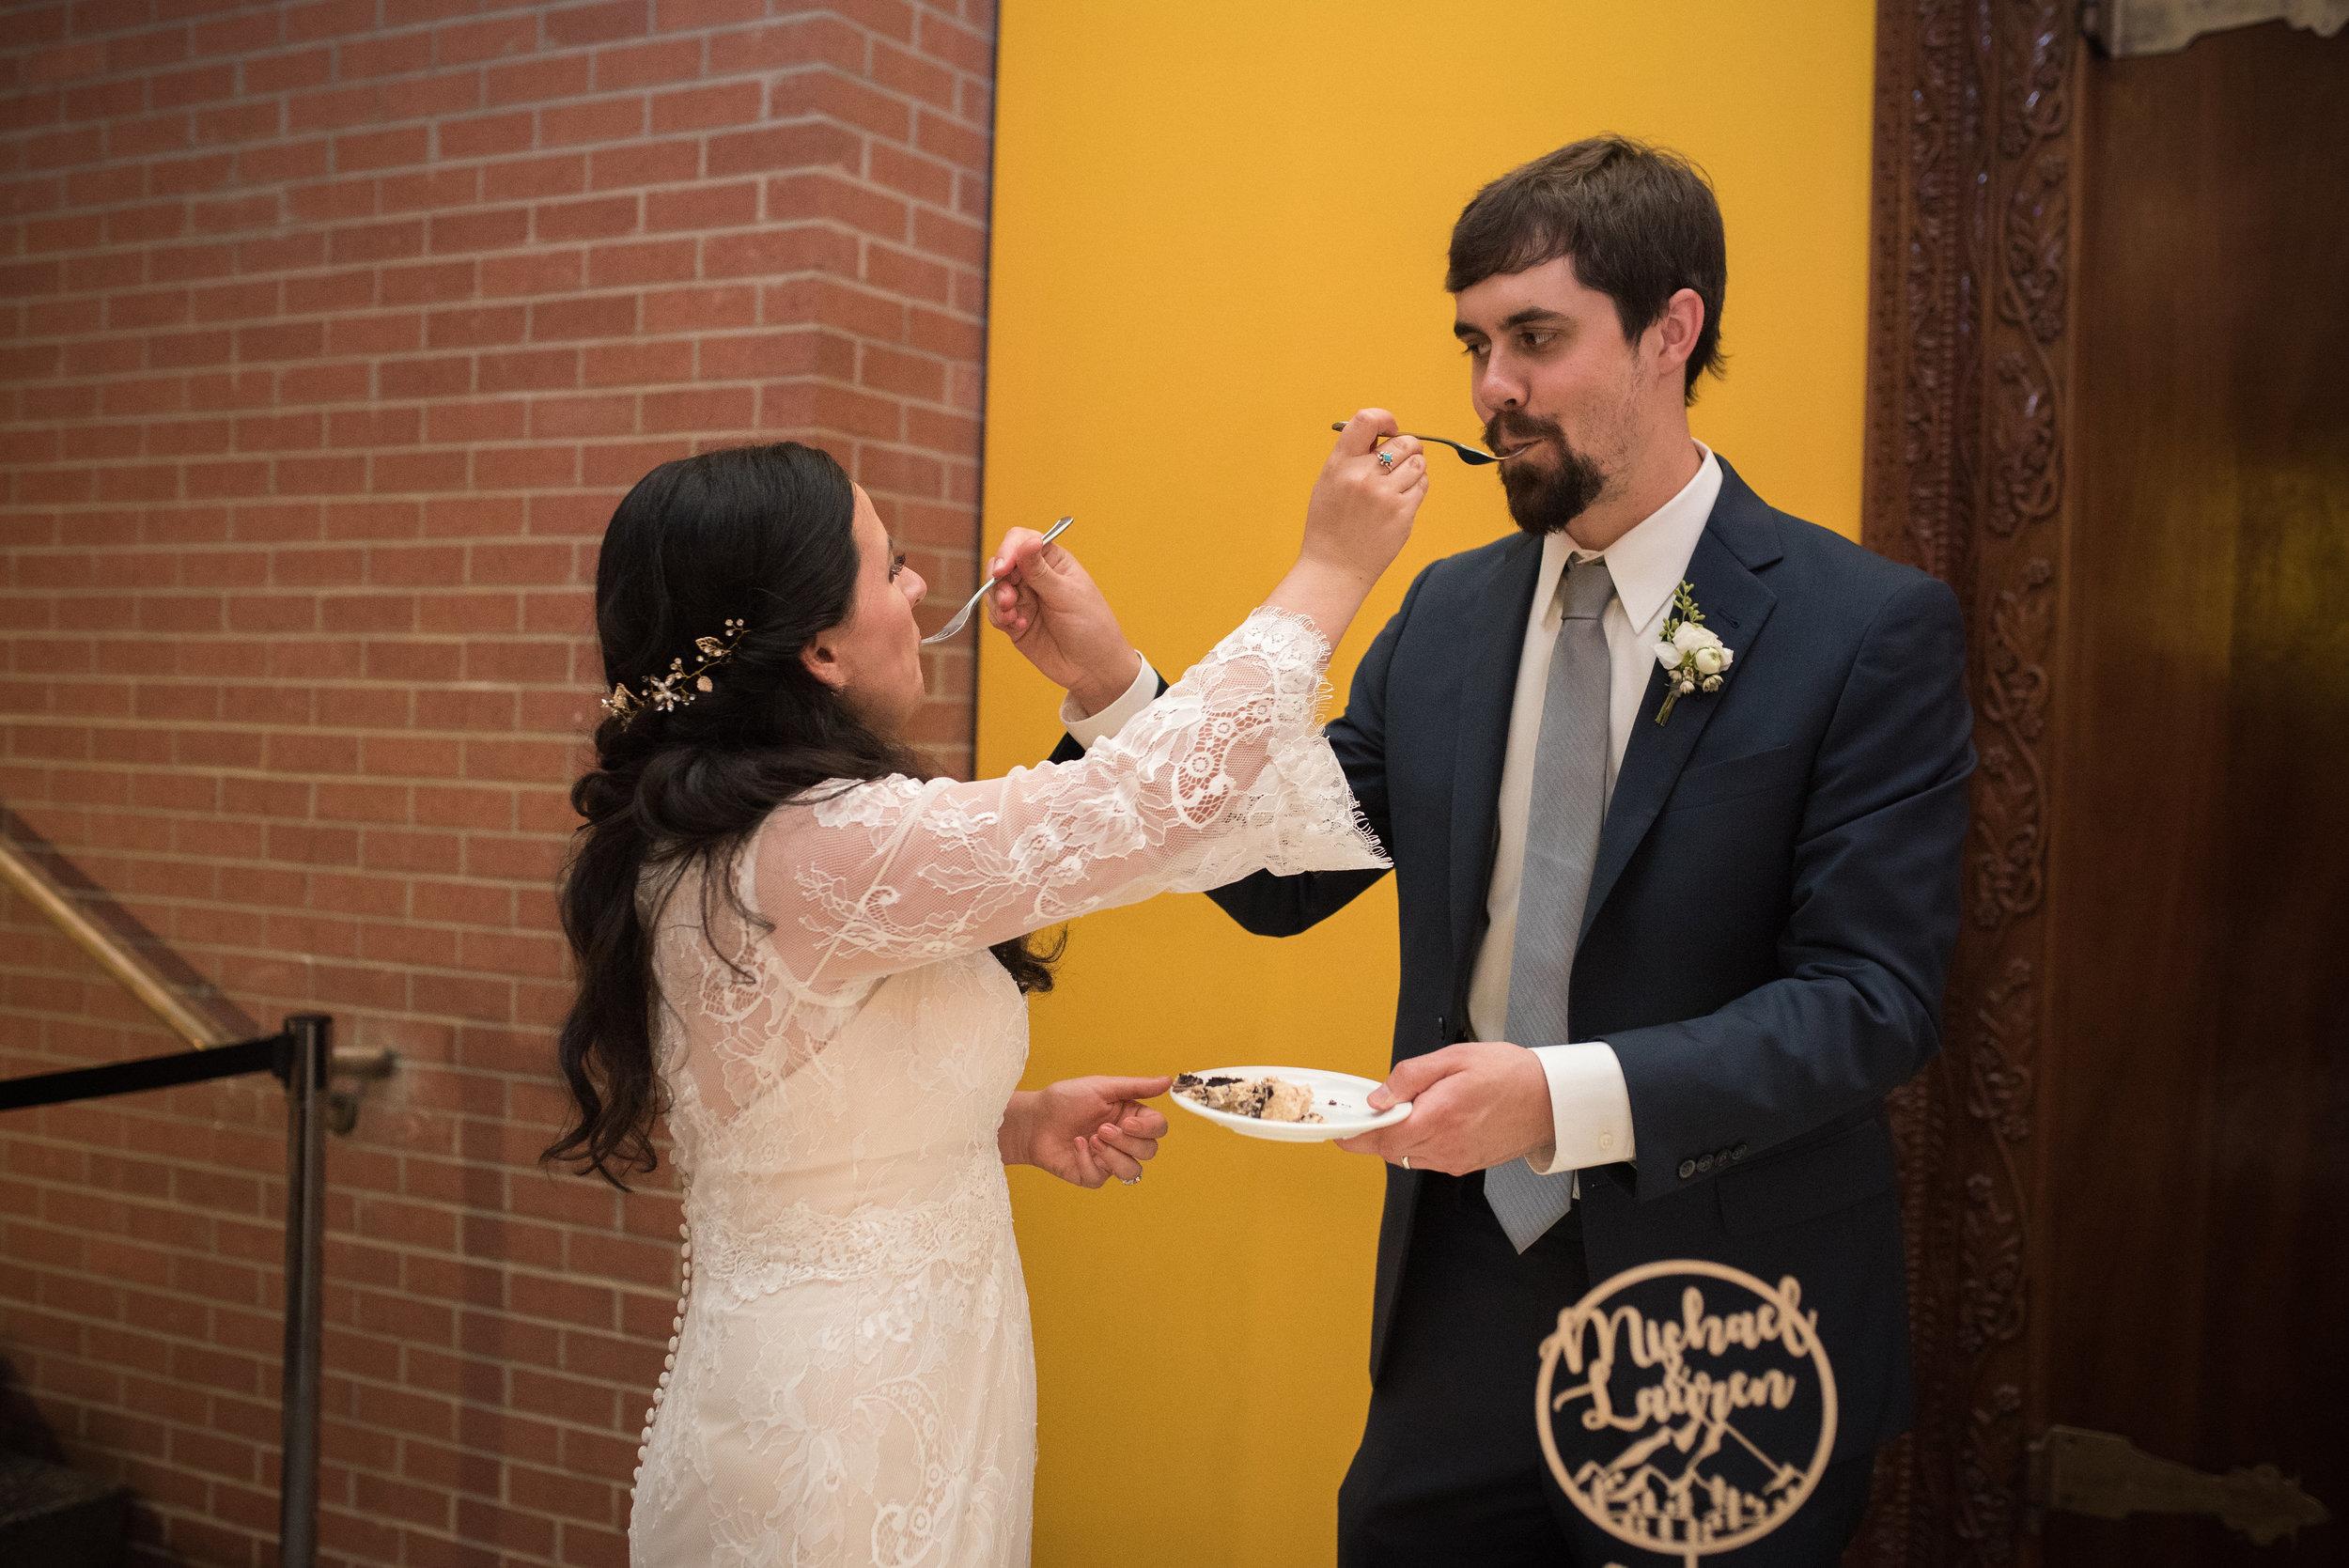 M&L-4410.jpgNorth Carolina Wedding Photographer - Raleigh Wedding - Marbles Wedding